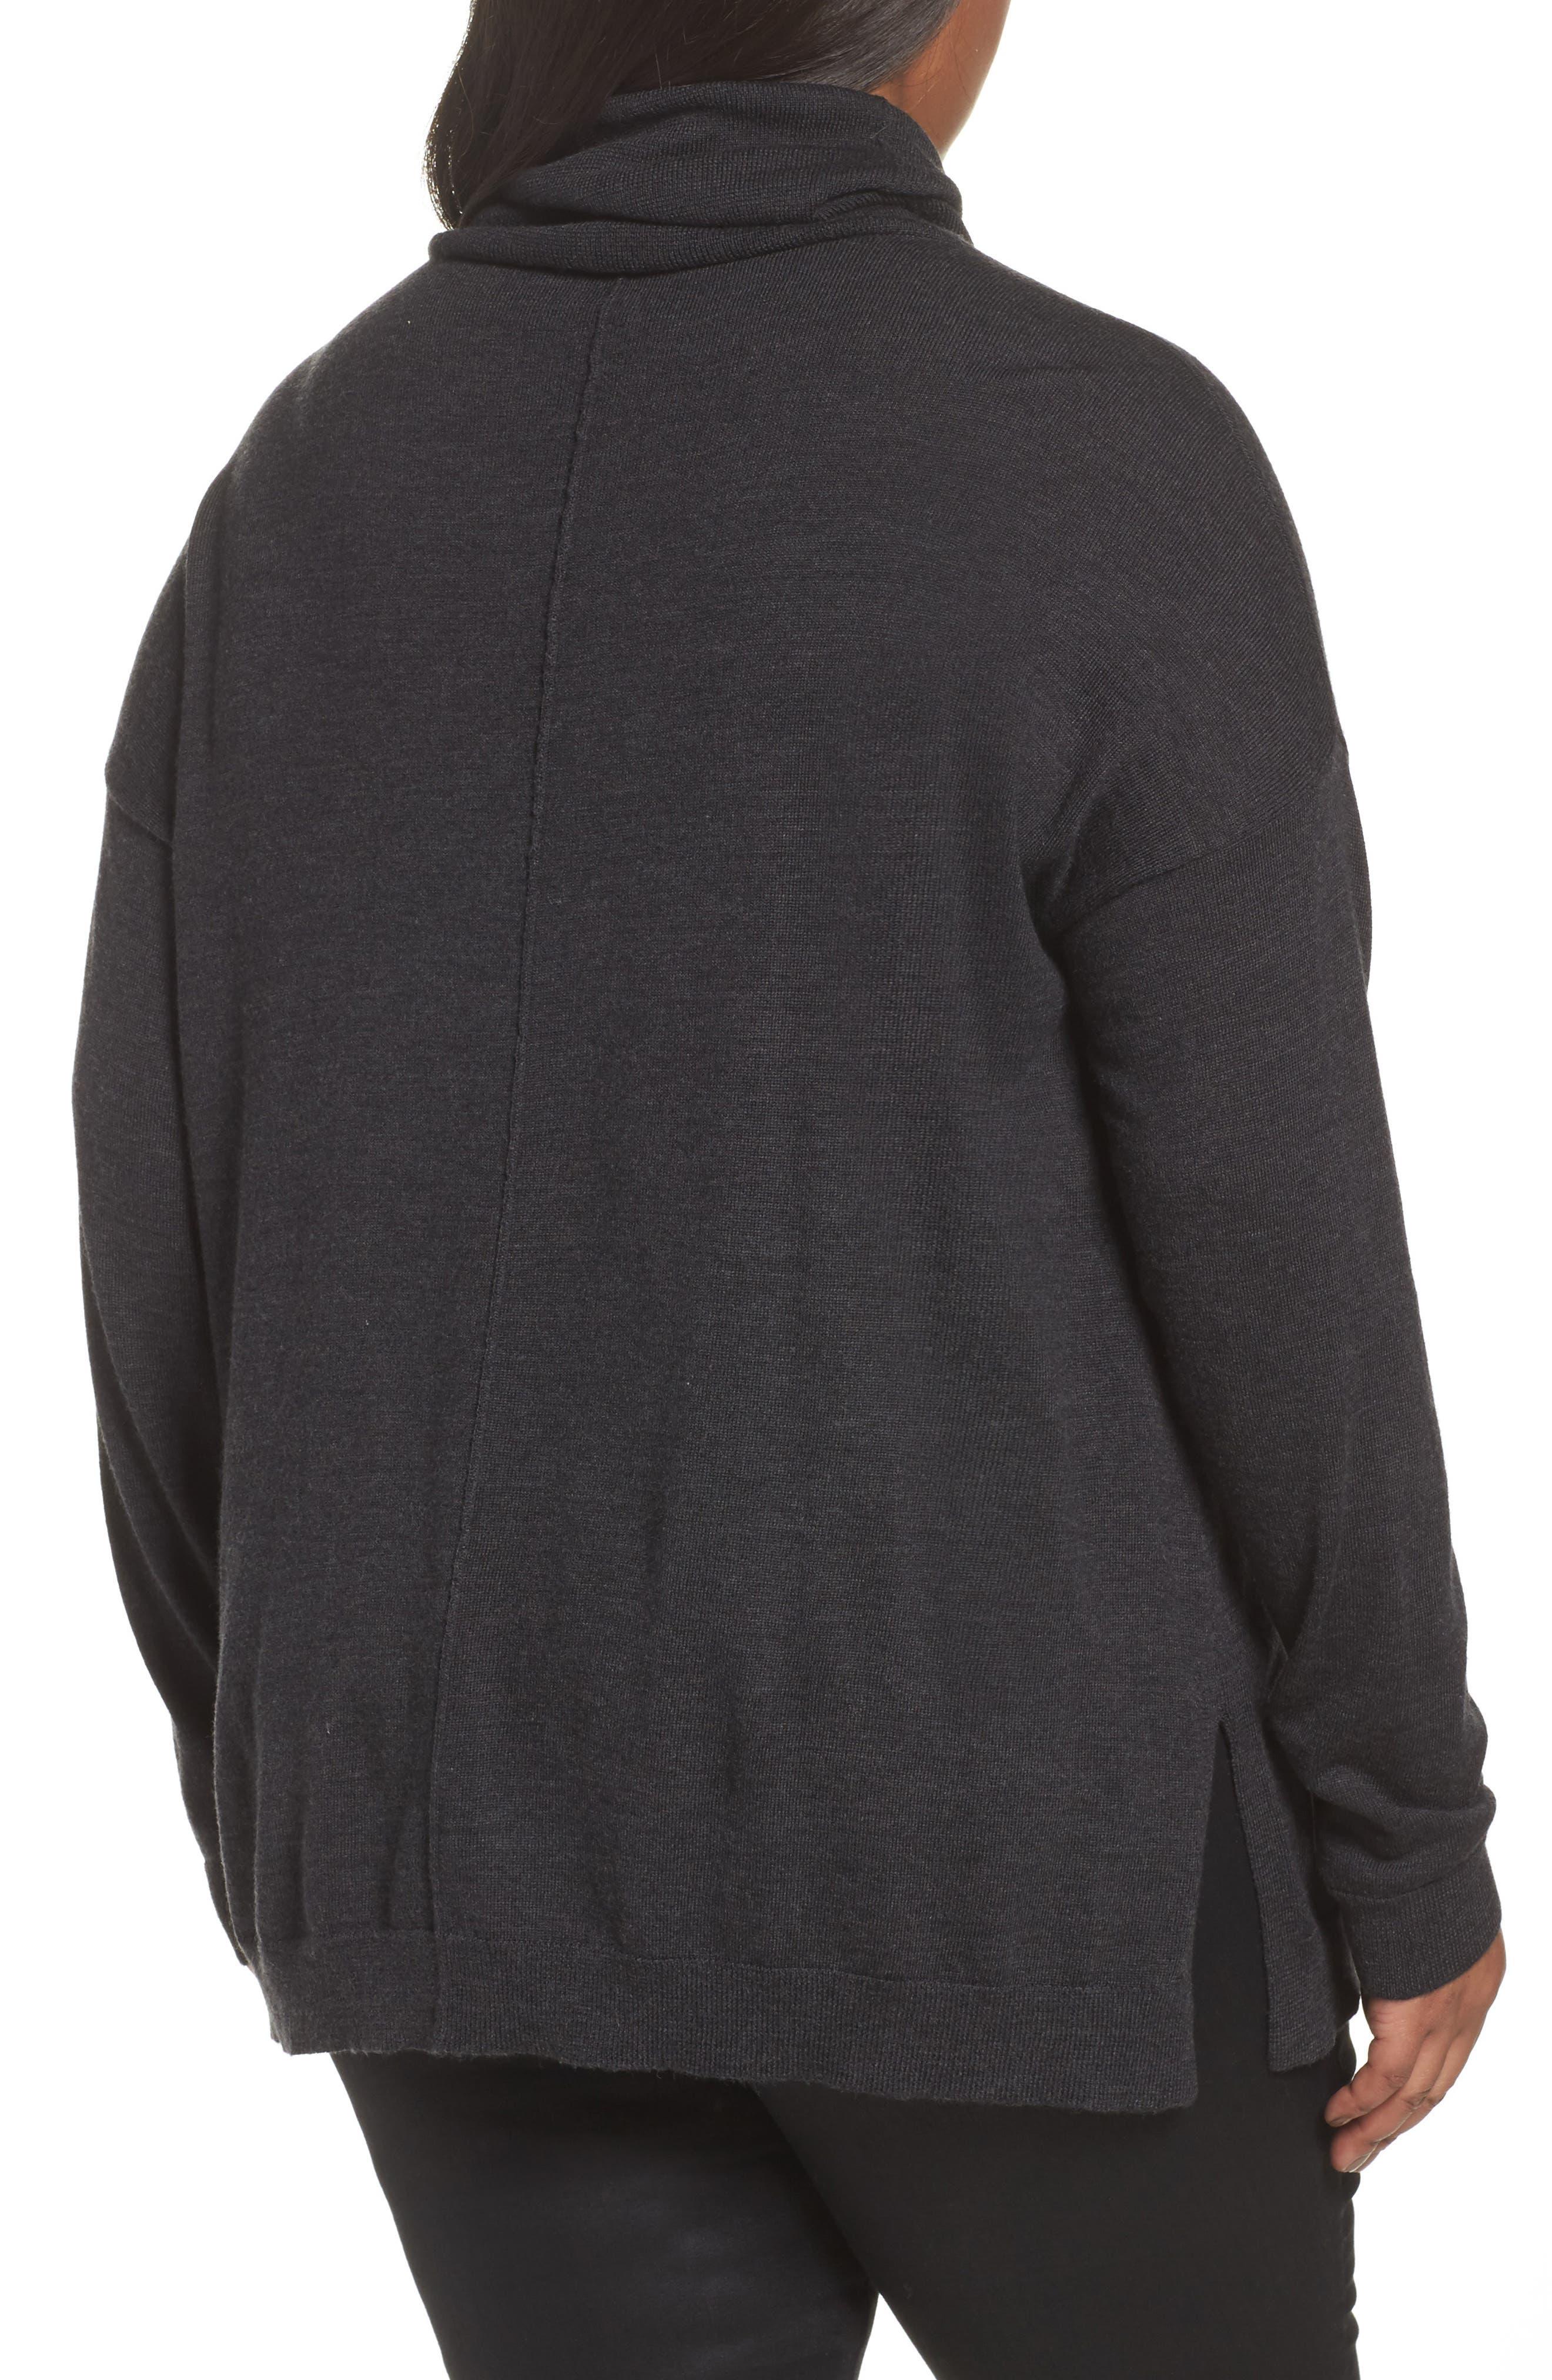 Alternate Image 2  - Eileen Fisher Merino Wool Turtleneck Sweater (Plus Size)